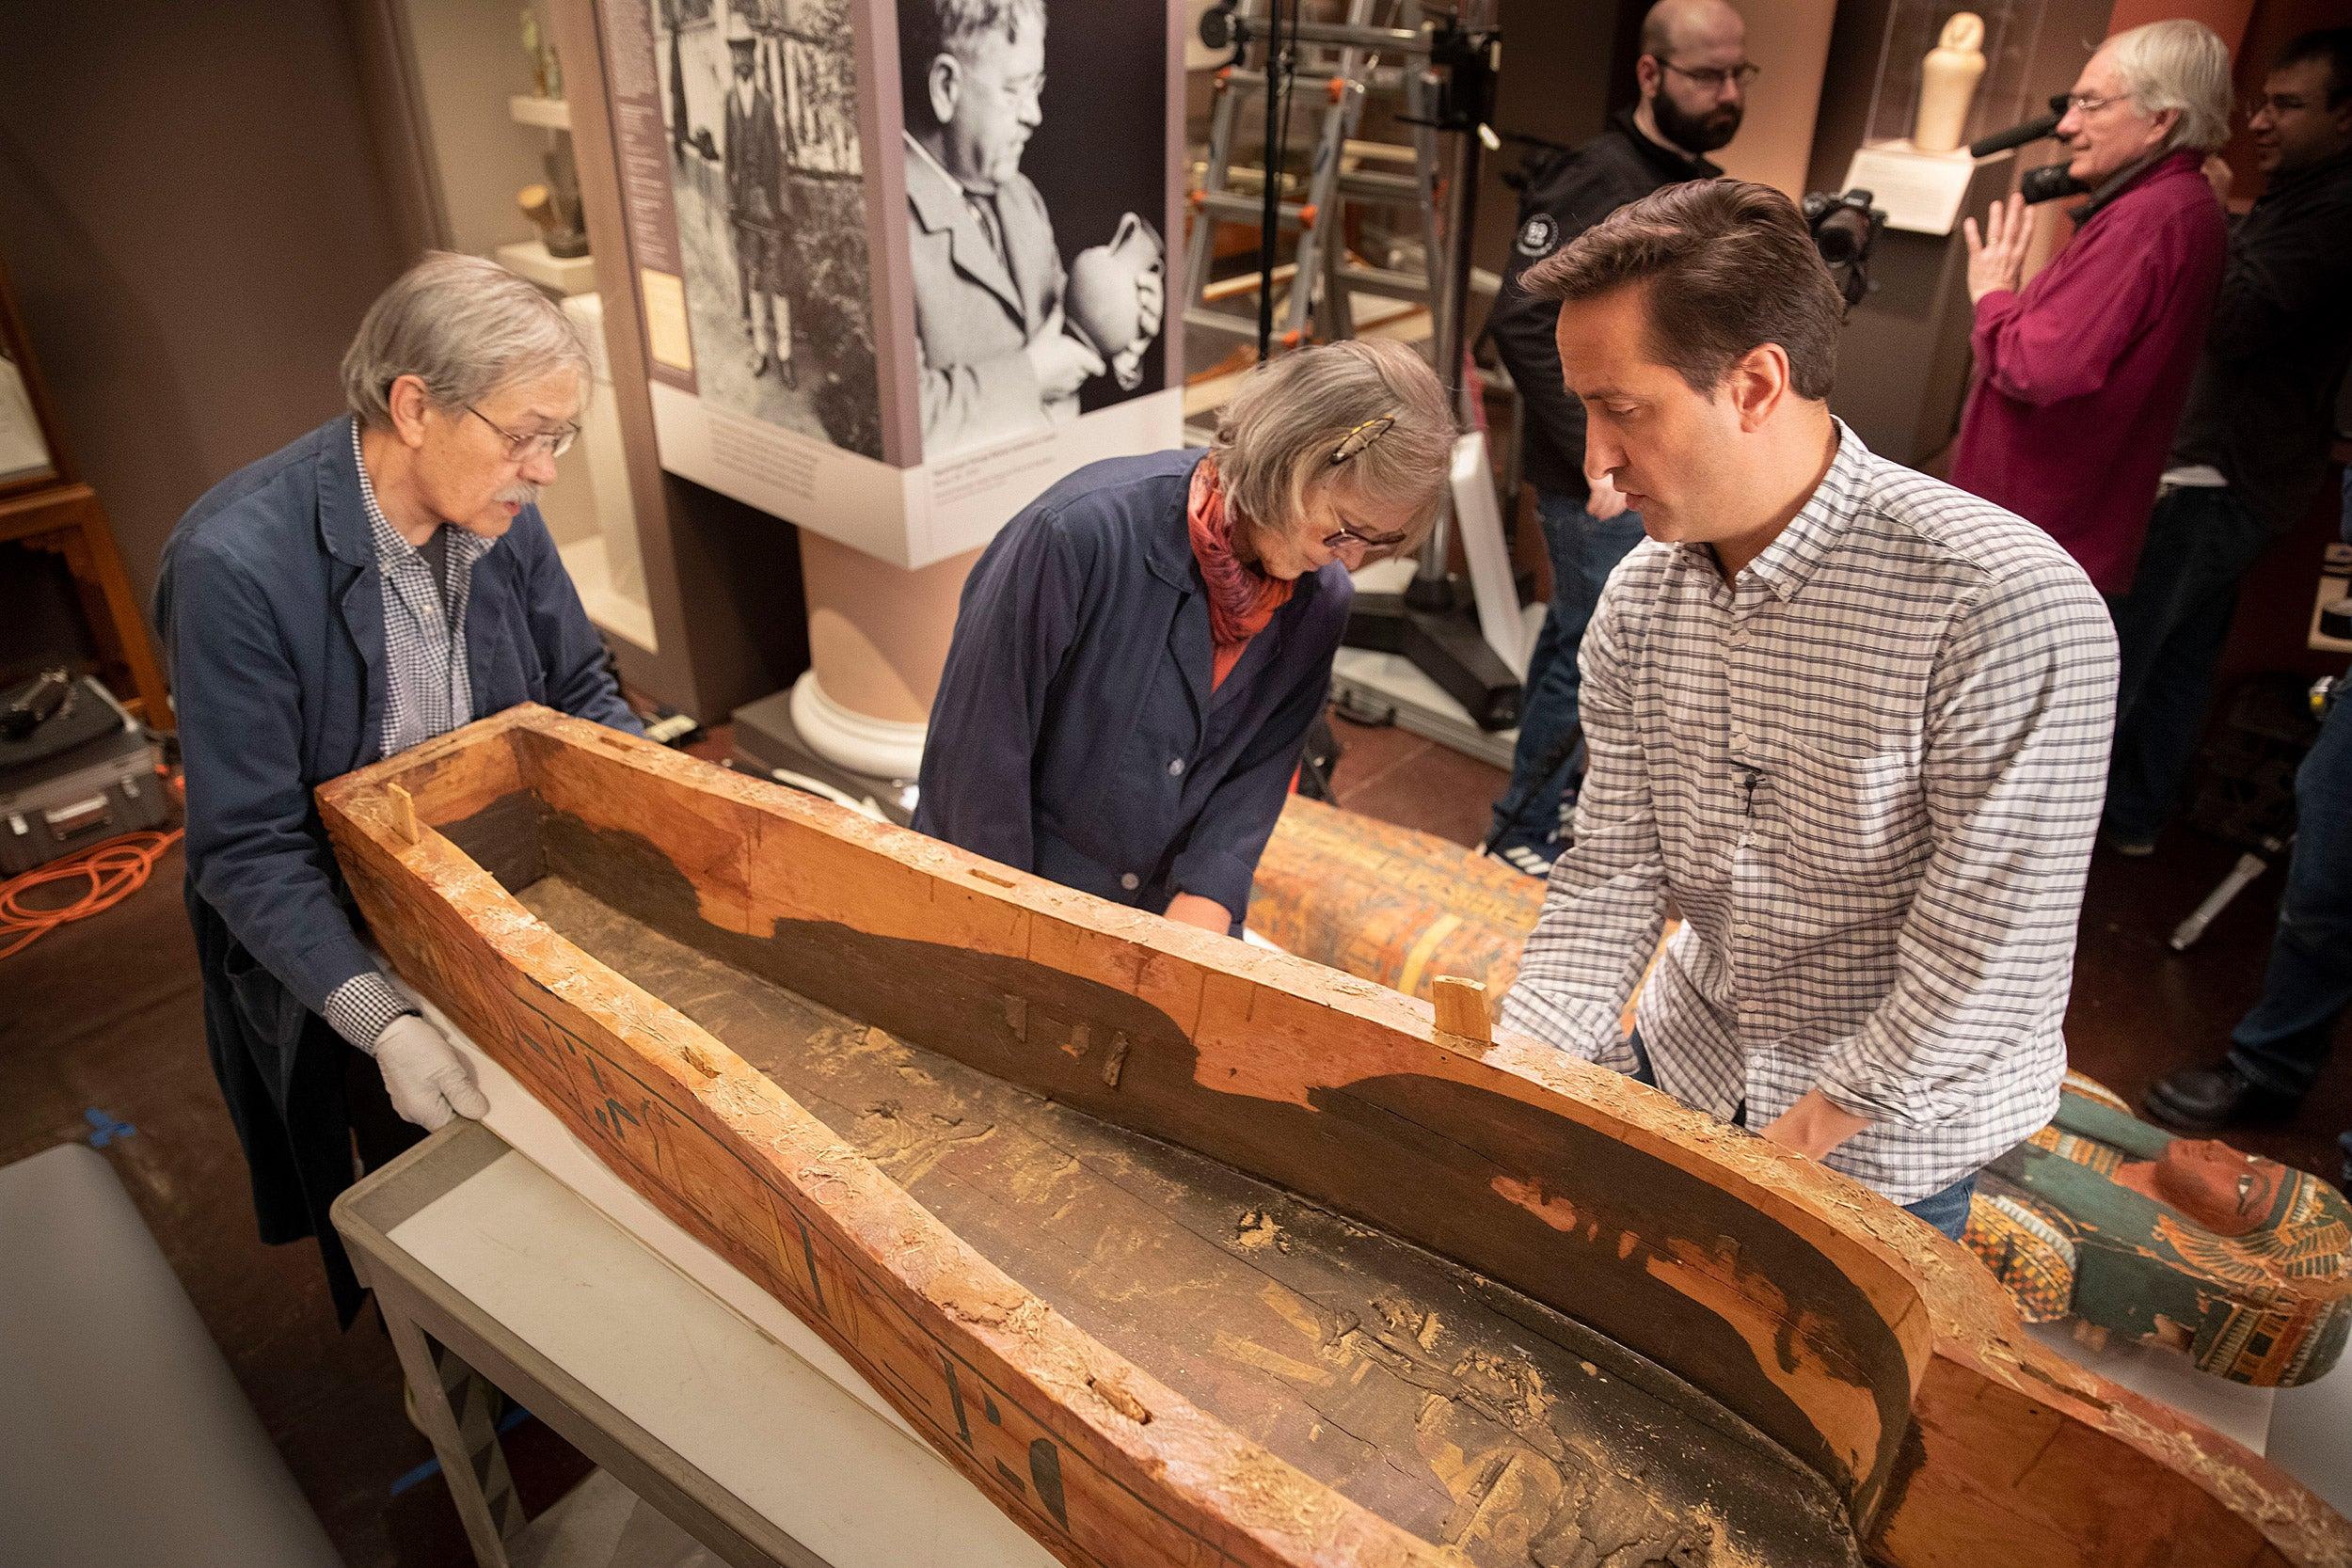 Dennis Piechota (left), Jane Drake, and Adam Aja view the interior of the coffin of Ankh-Khonsu. Kris Snibbe/Harvard Staff Photographer